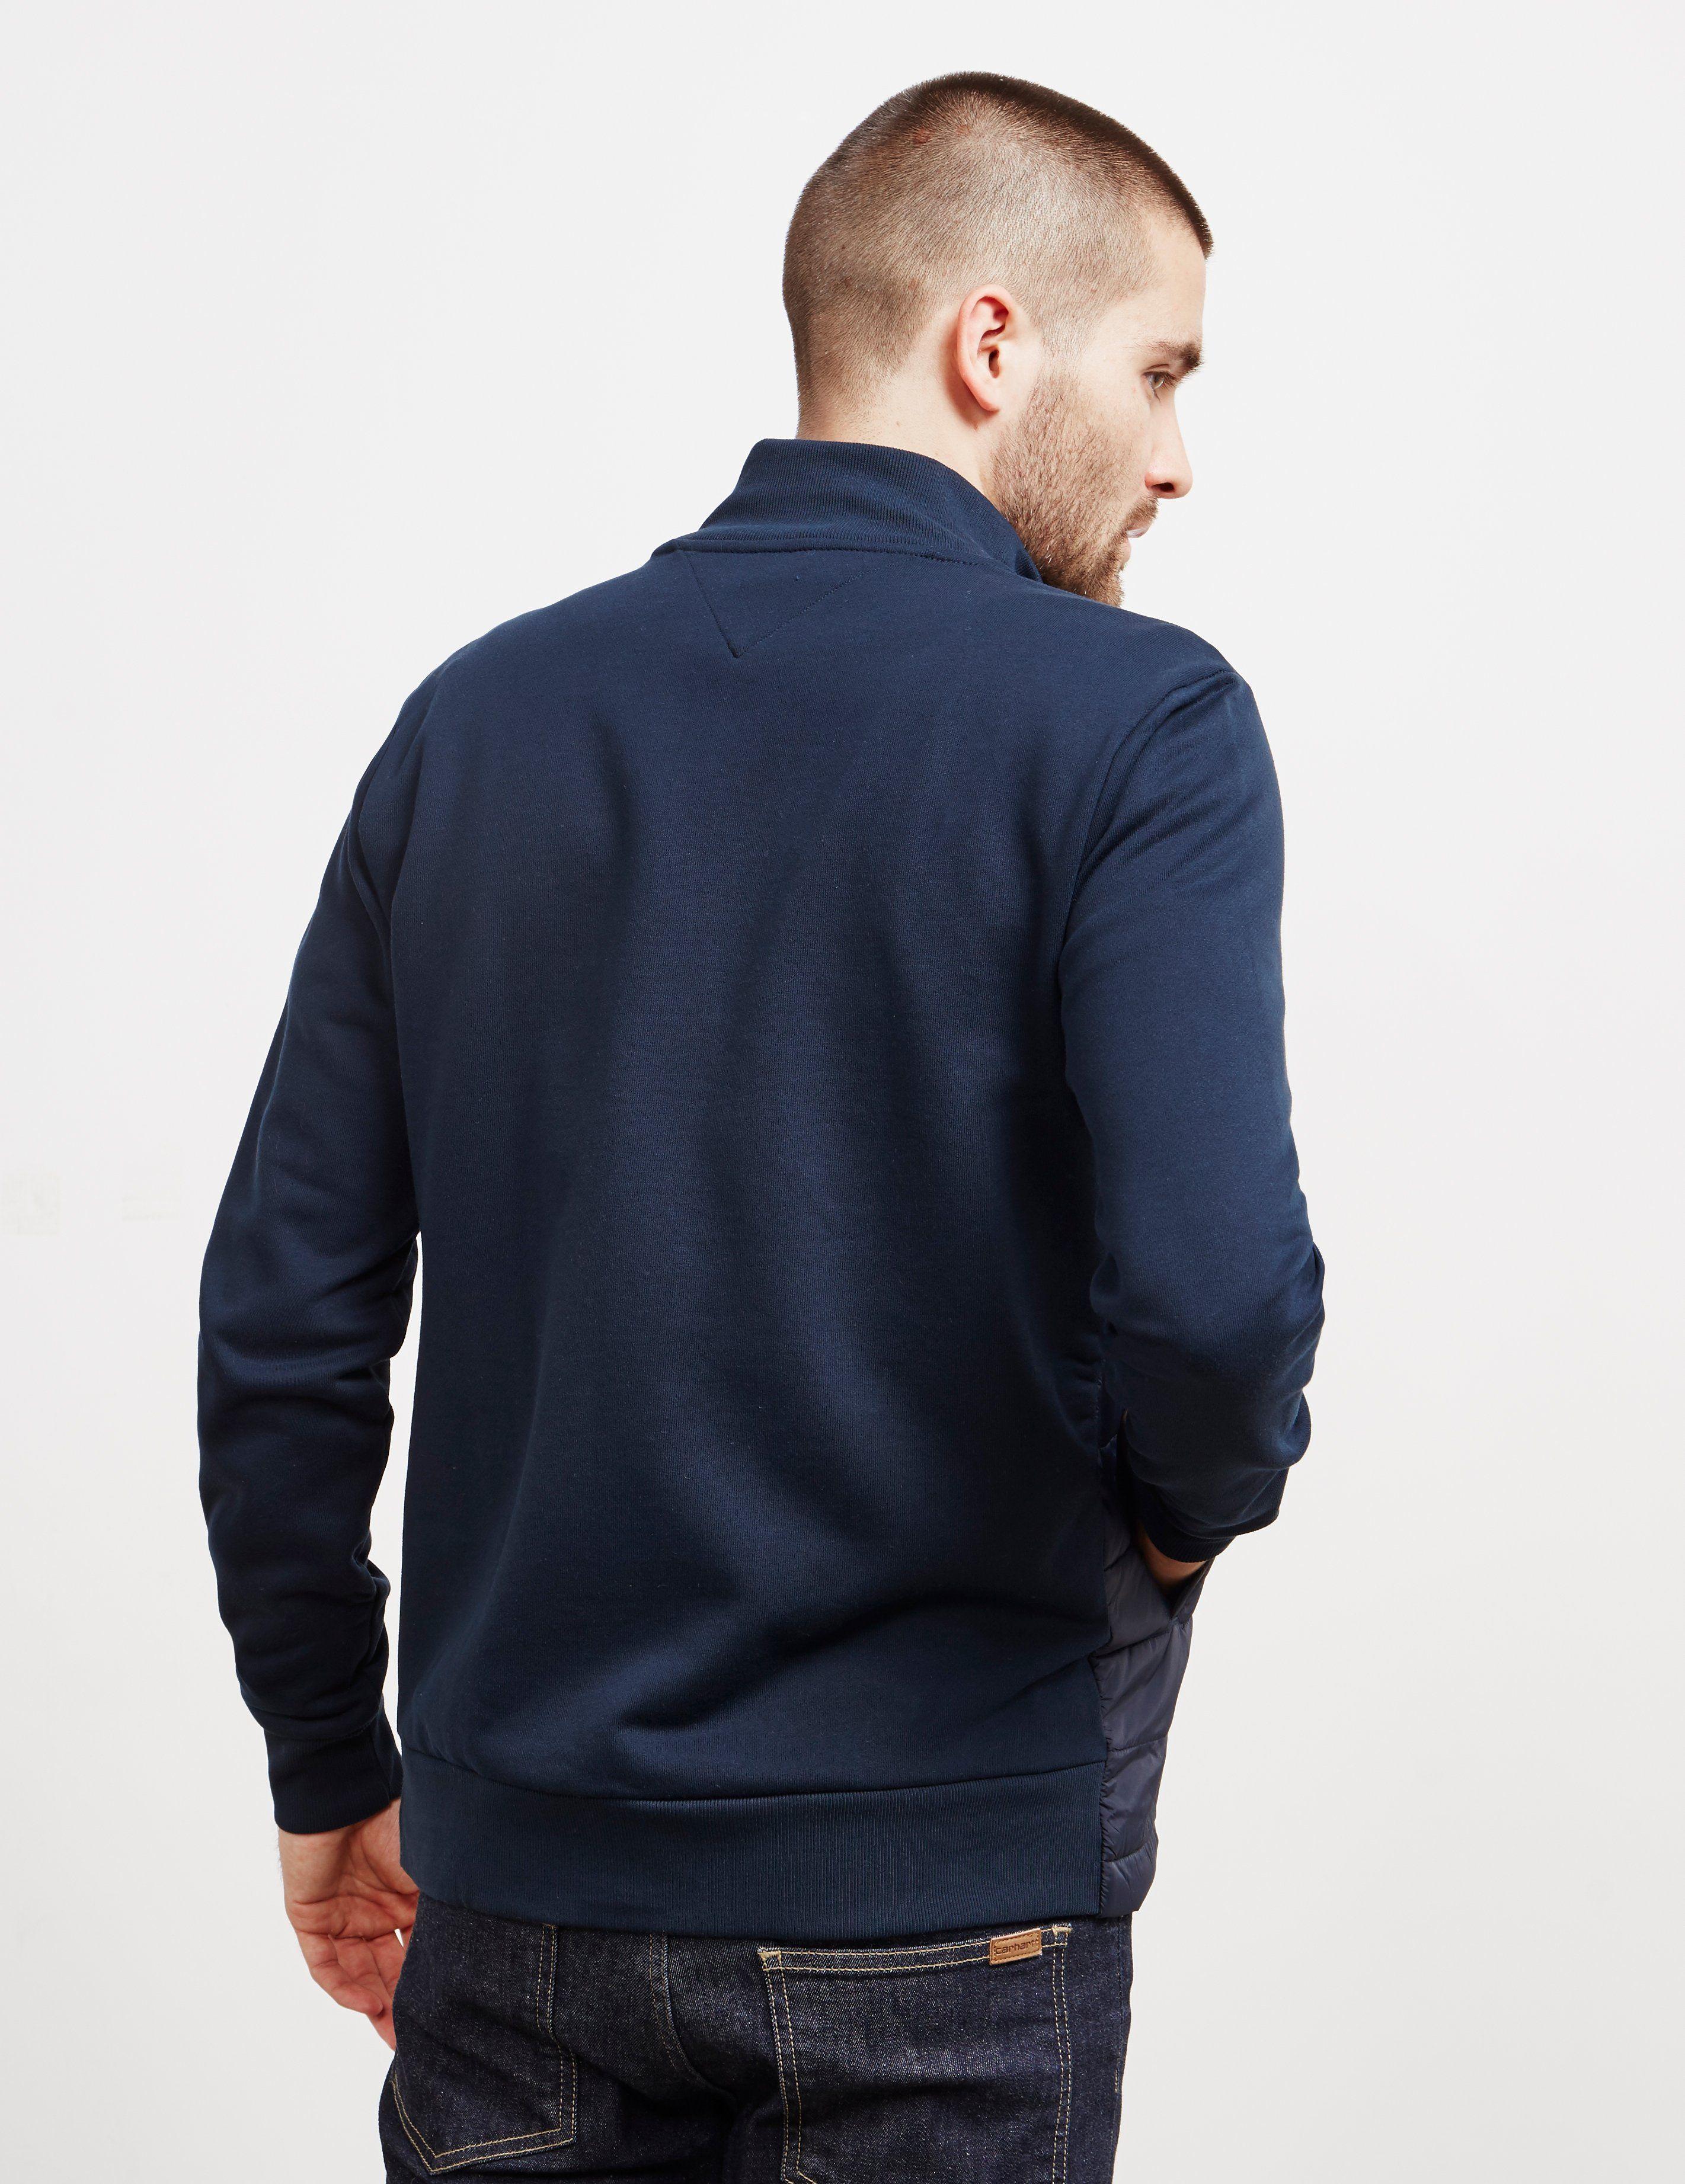 Tommy Hilfiger Mixed Baffle Full Zip Sweatshirt